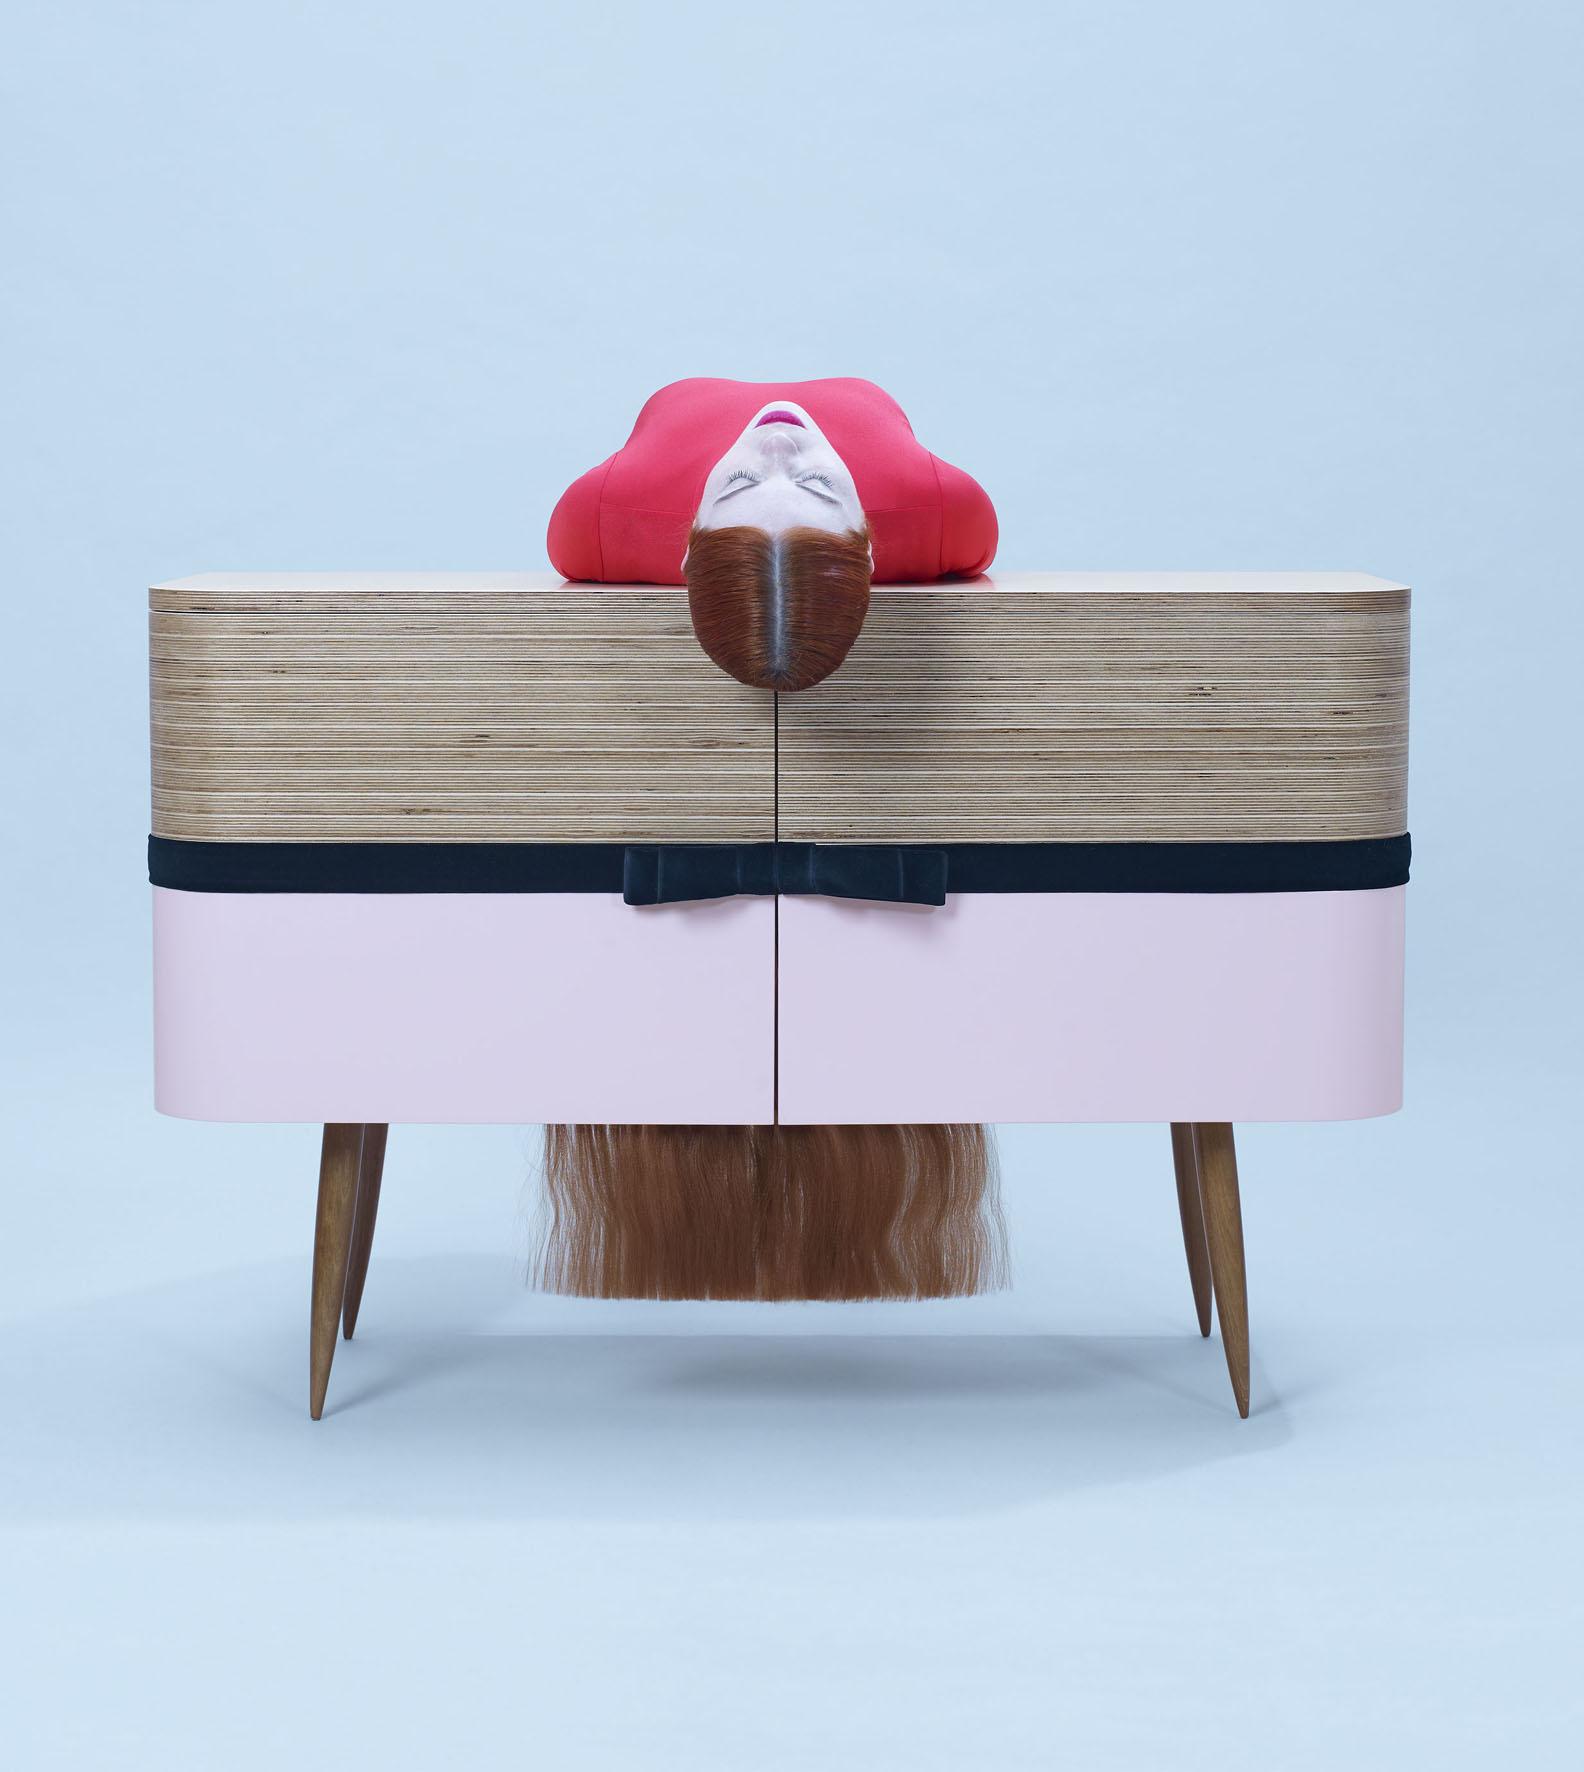 galerie joseph at paris design week 2016 tlmagazine. Black Bedroom Furniture Sets. Home Design Ideas